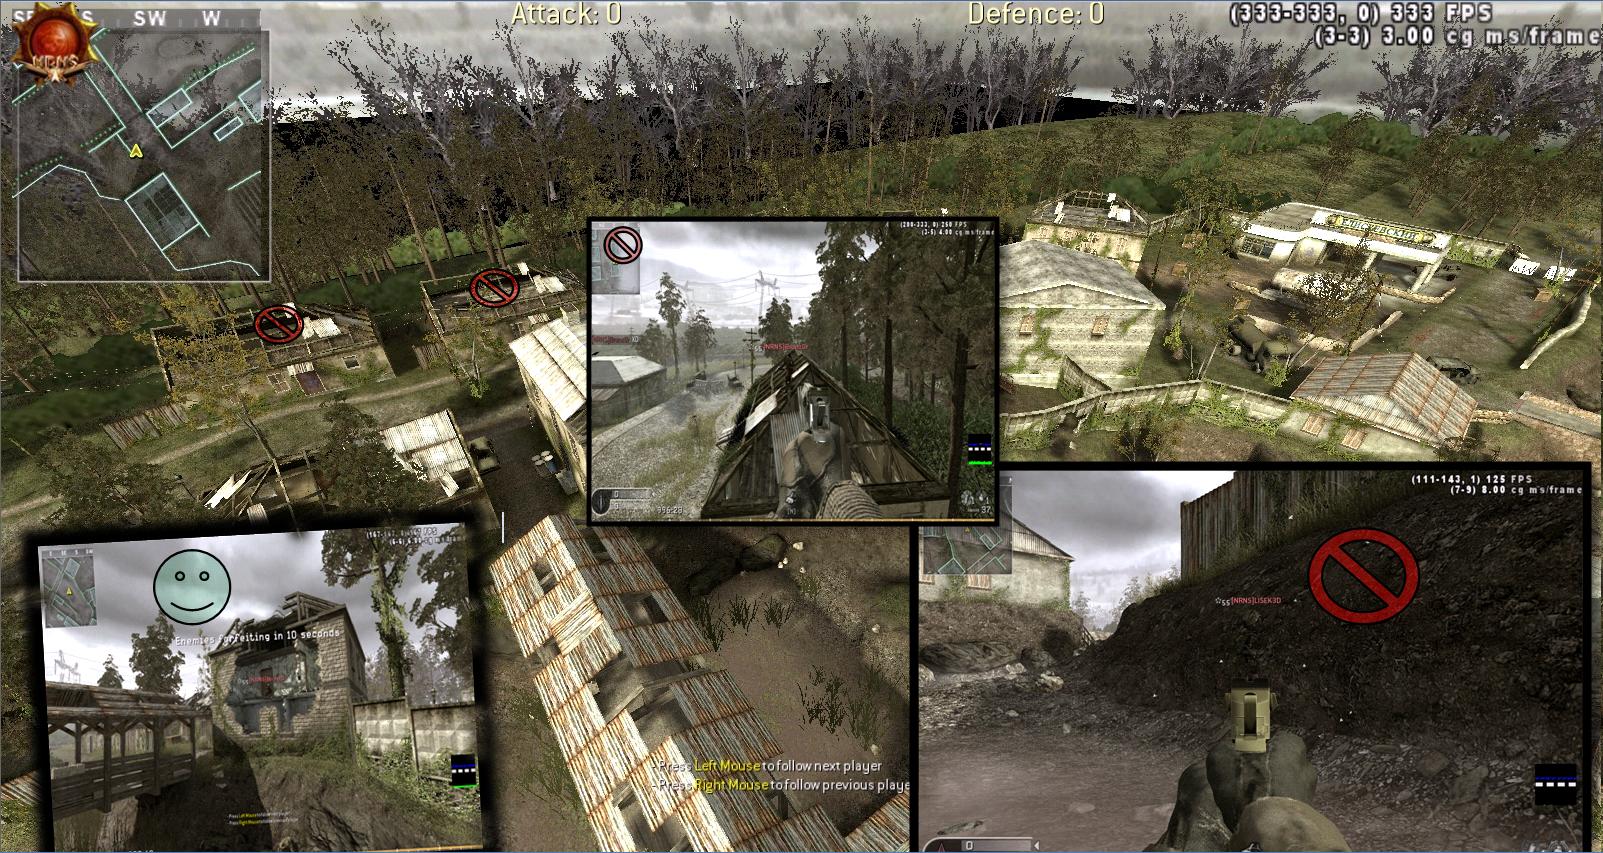 http://nrns-games.com/gallery/27551_28_11_15_4_06_43.png